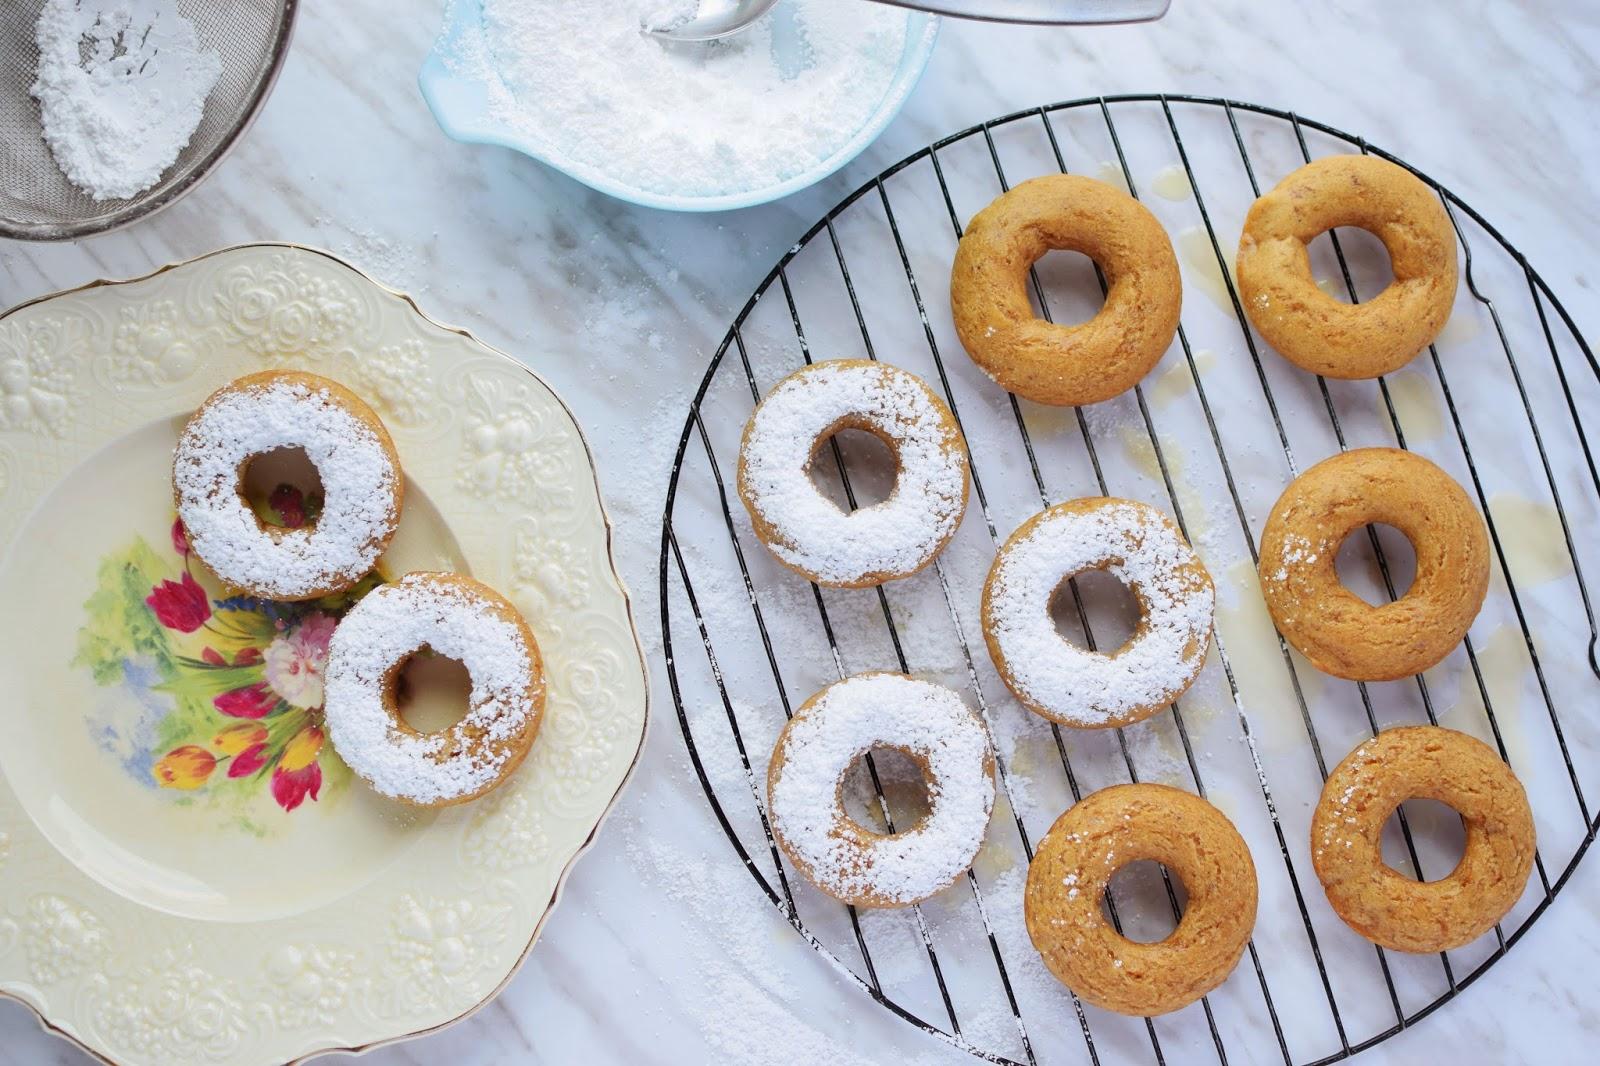 vegan gluten-free donuts